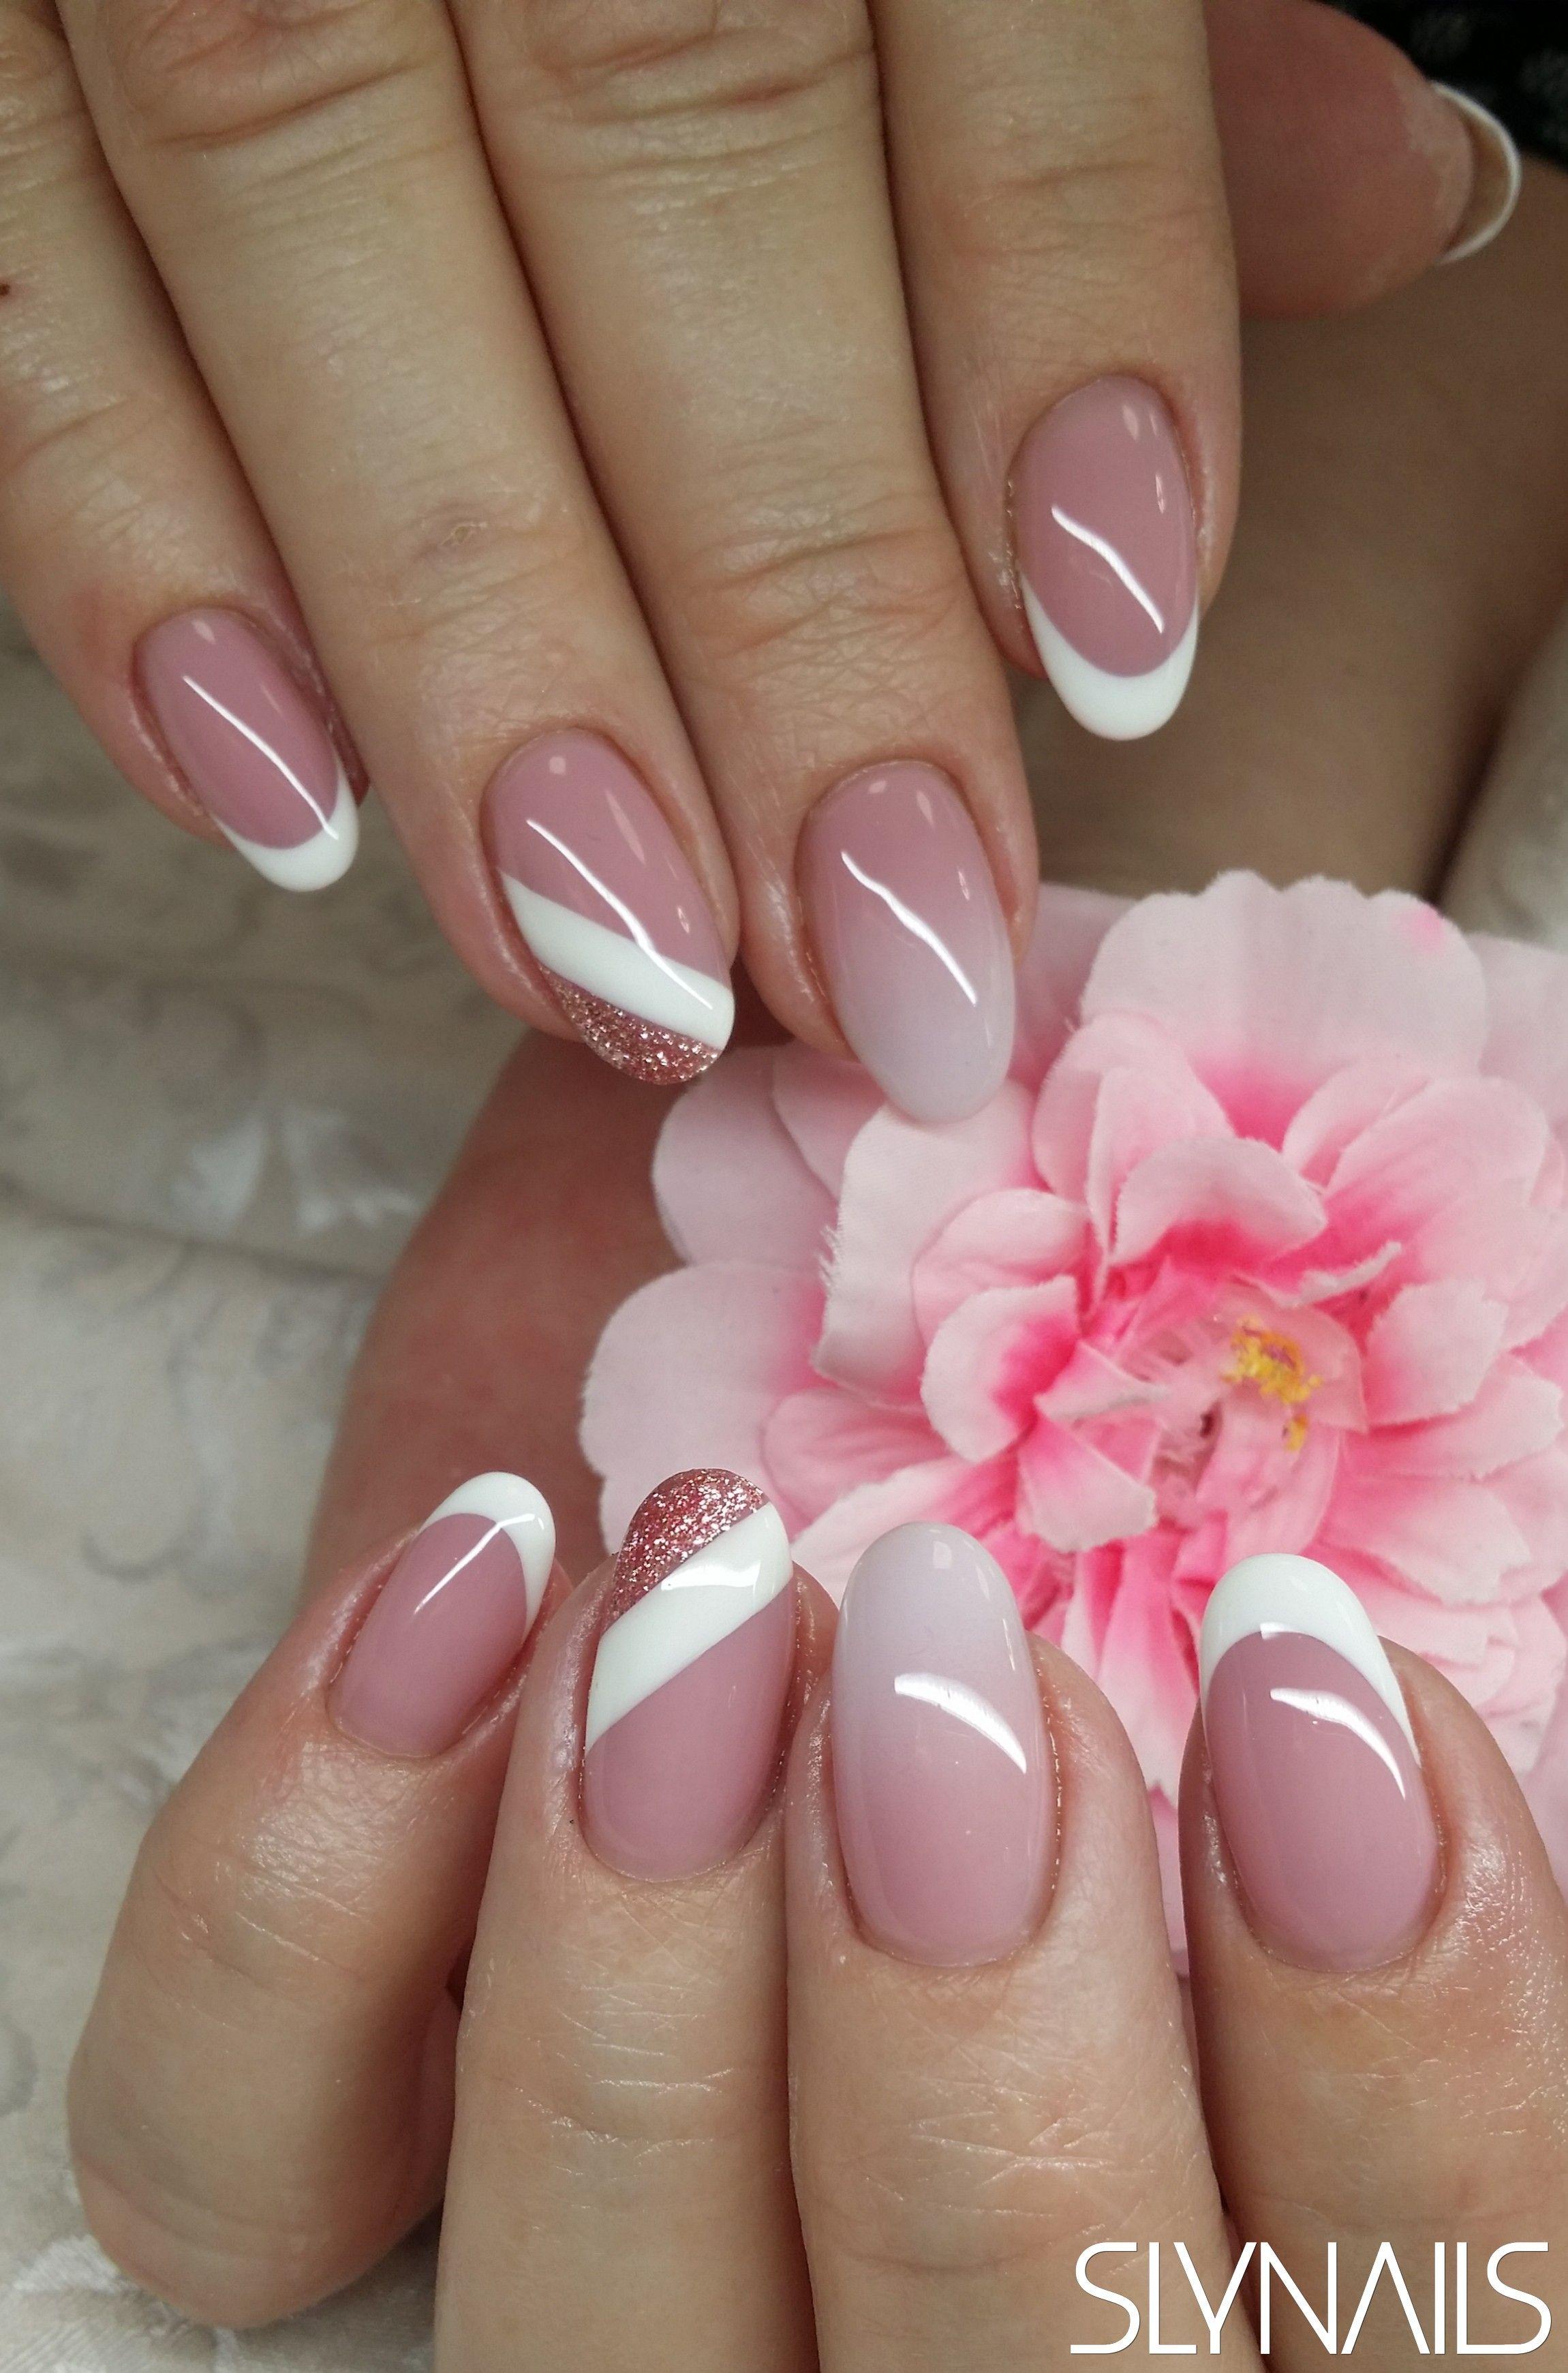 Mandula Babyboomer Zseles Diszites Francia Feher Zseles Mukorom Trendy Nail Art Nail Art Wedding New Nail Art Design